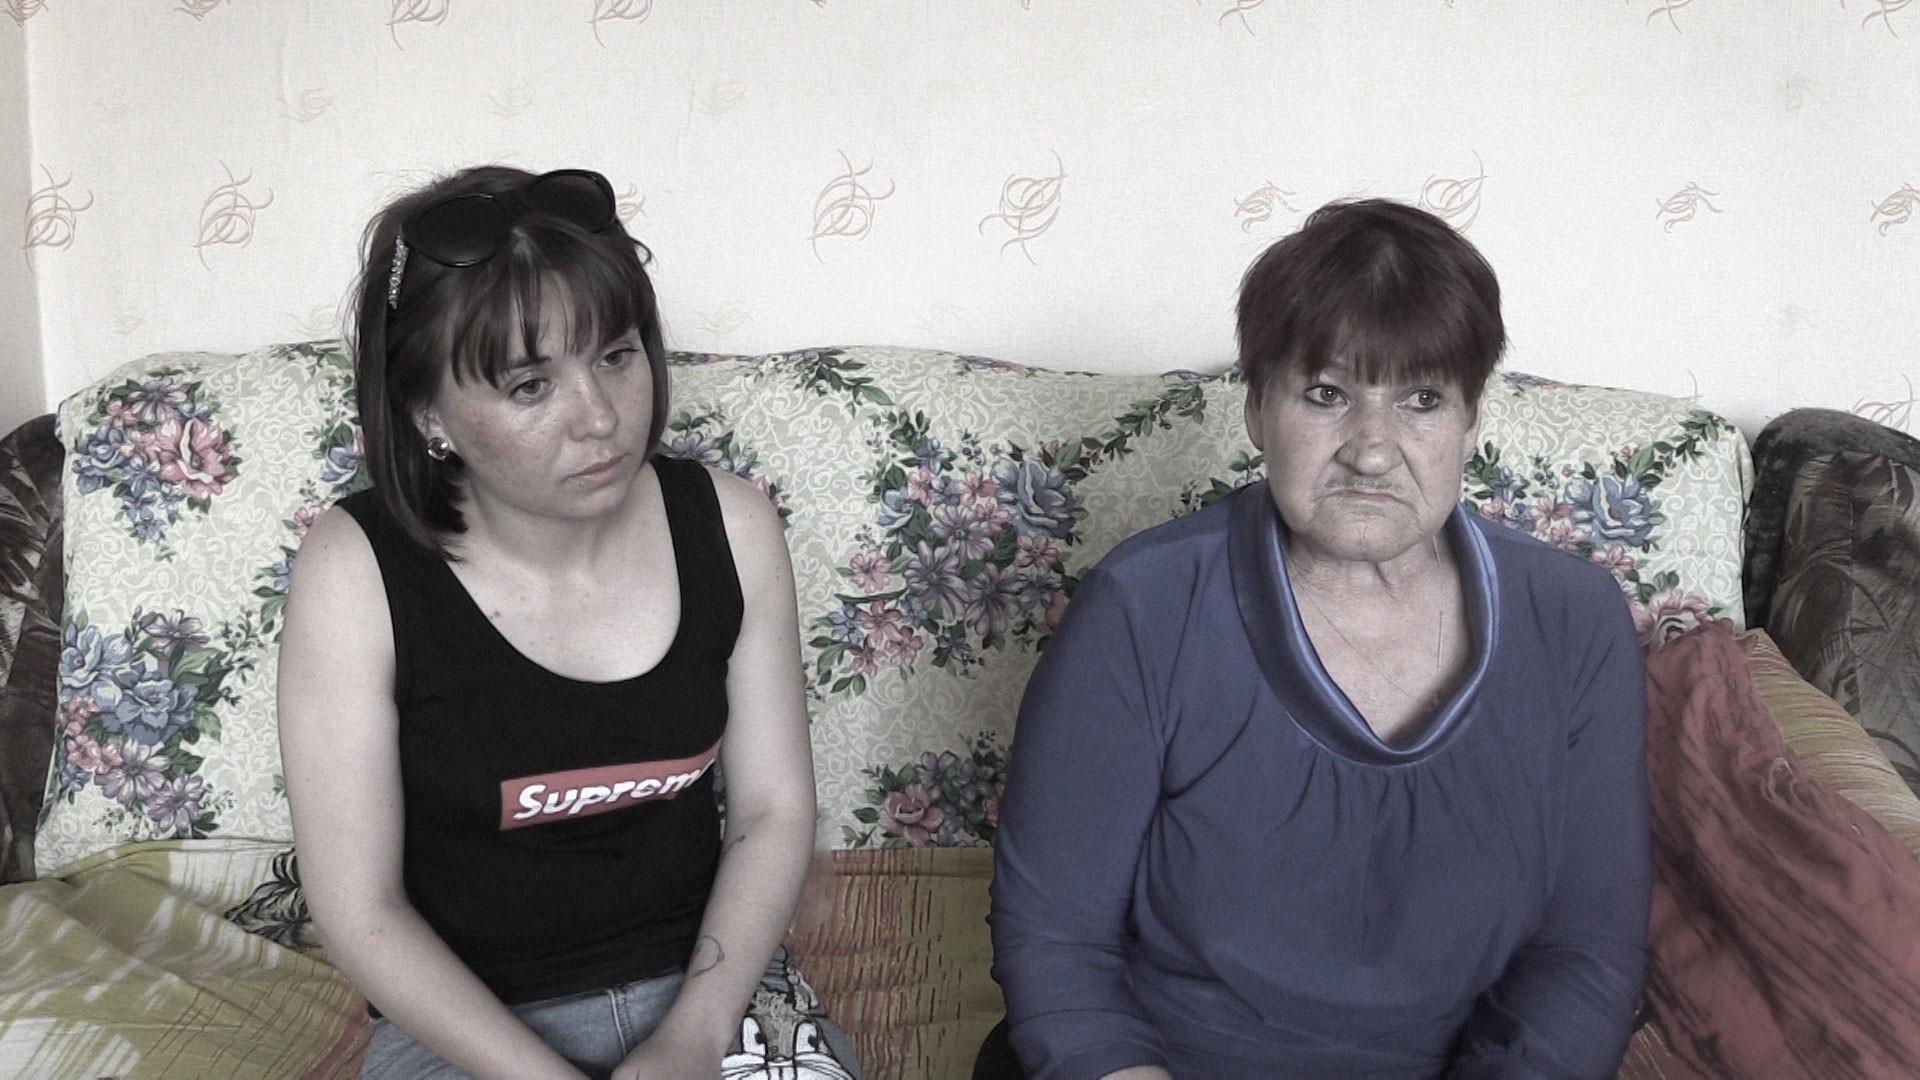 Вдова и мать Александра Верхотурова. Фото © L!FE